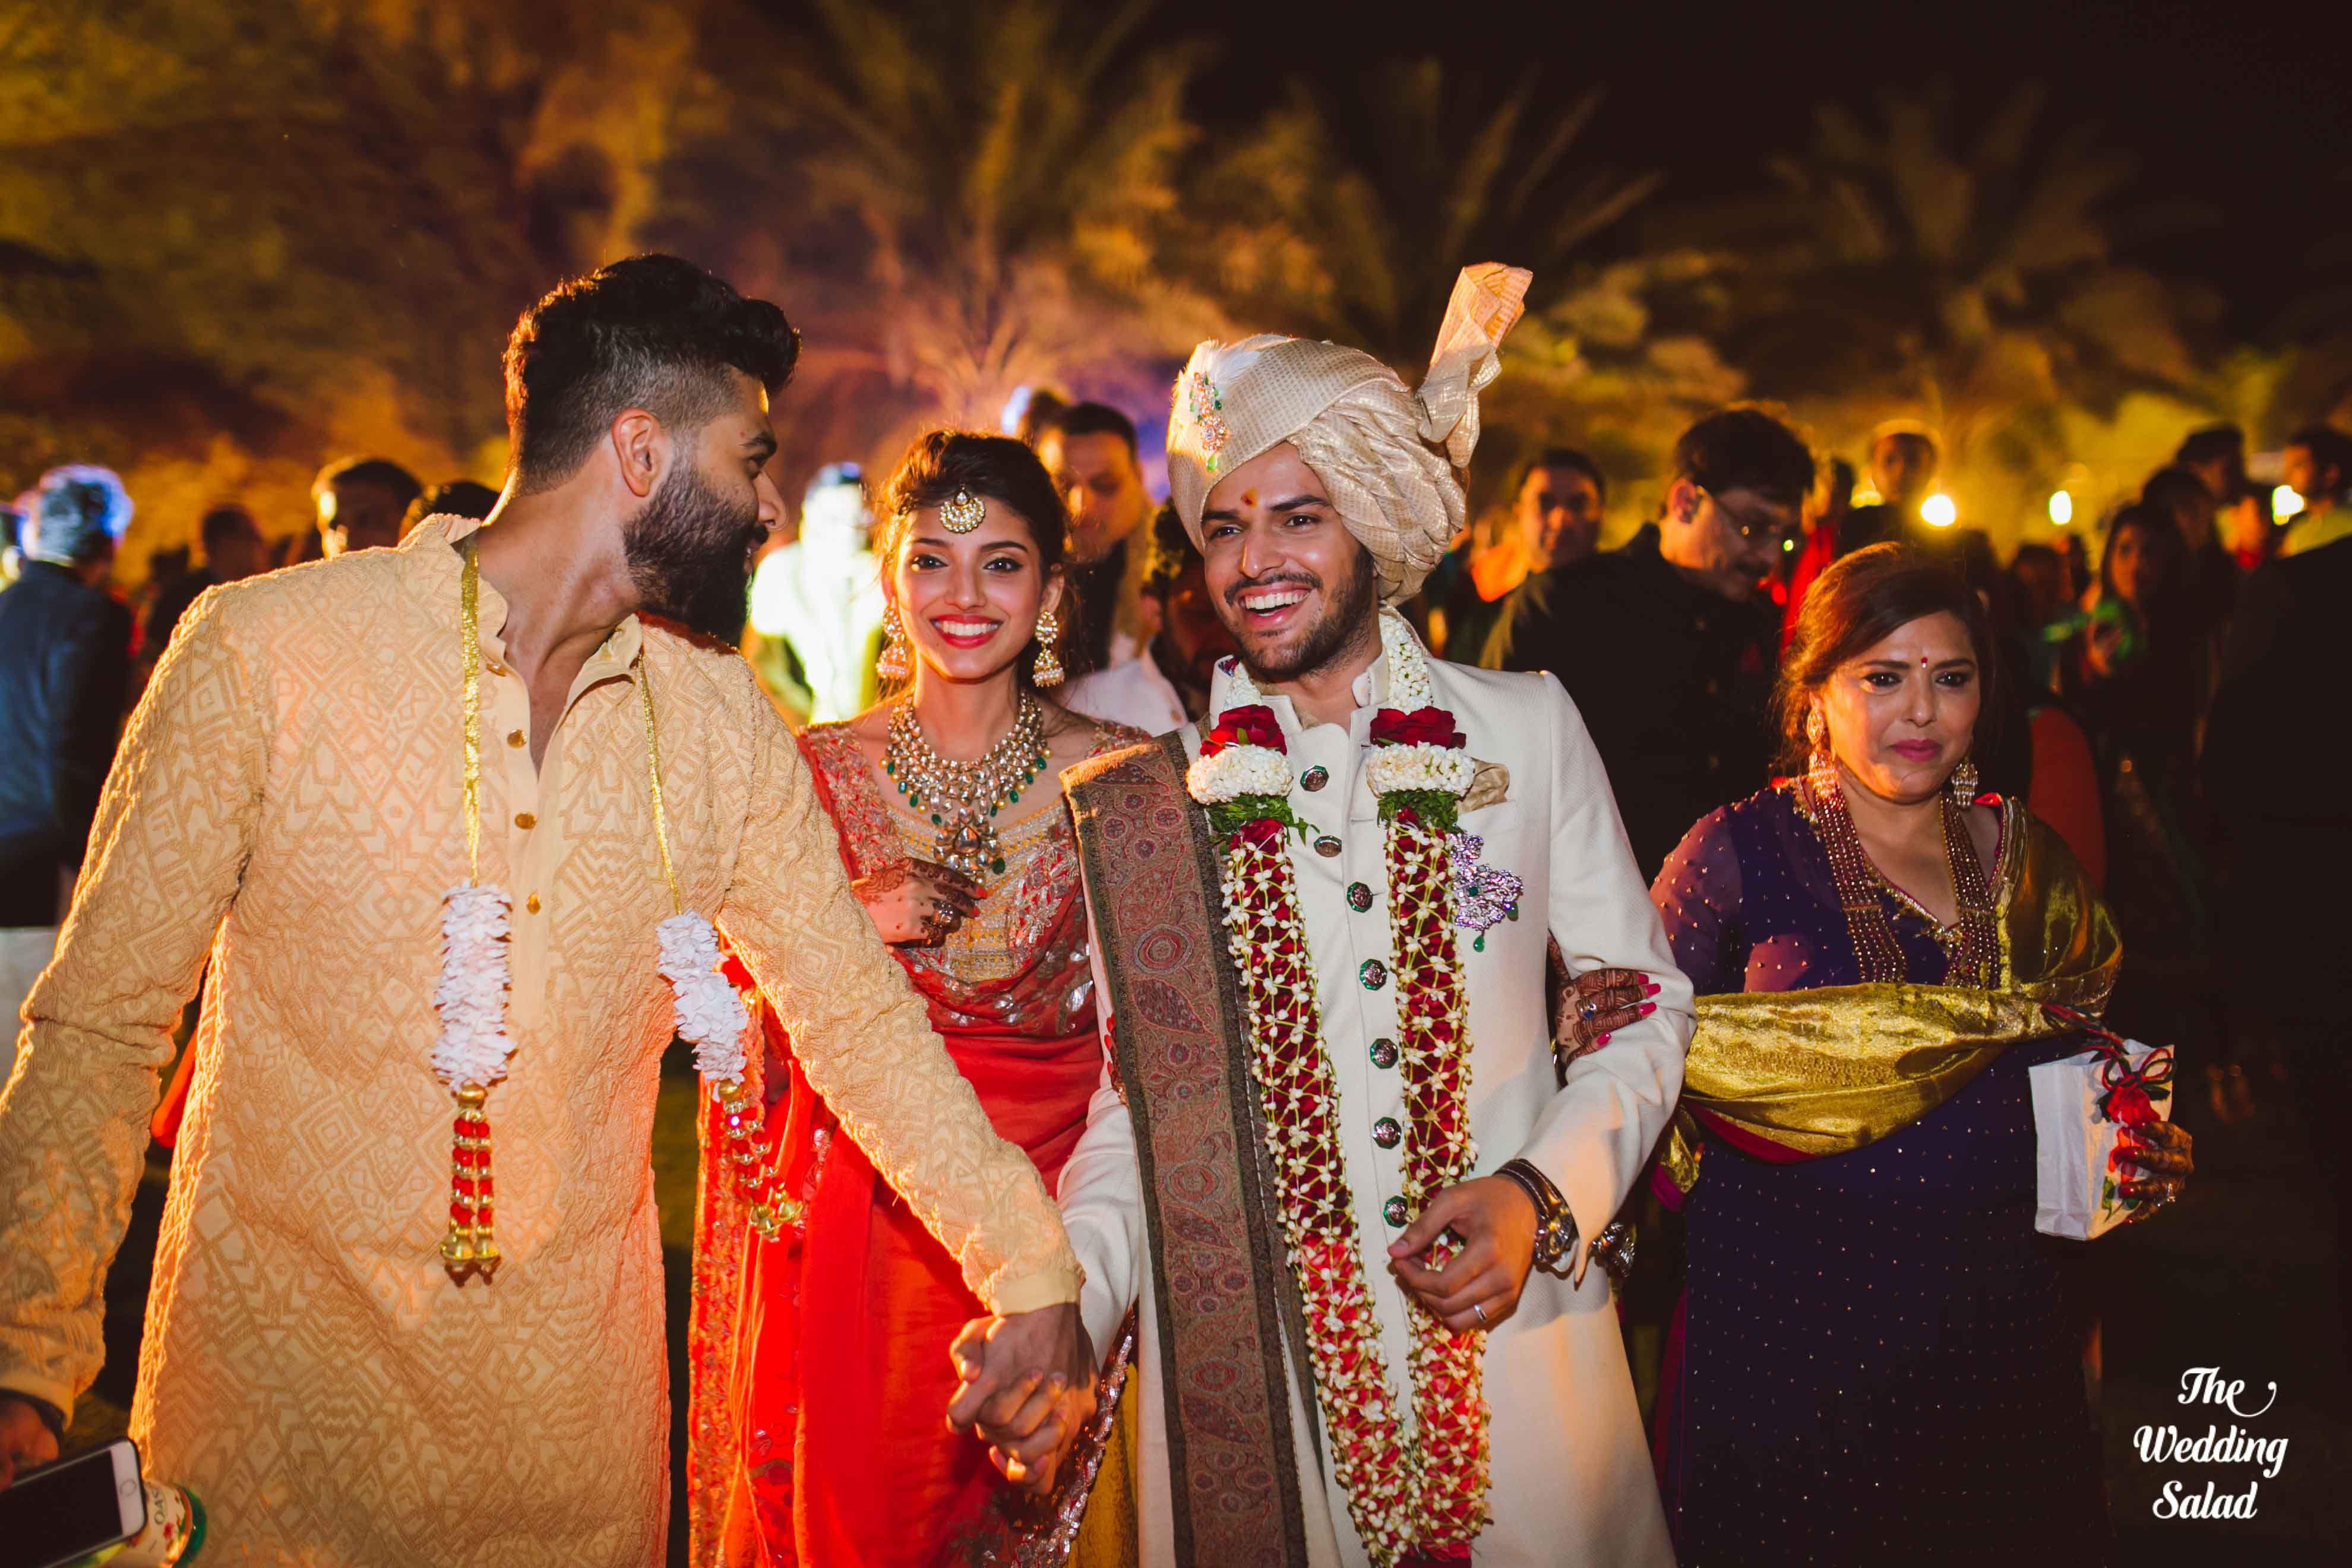 the handsome groom!:the wedding salad, manish malhotra, arpita mehta, sabyasachi couture pvt ltd